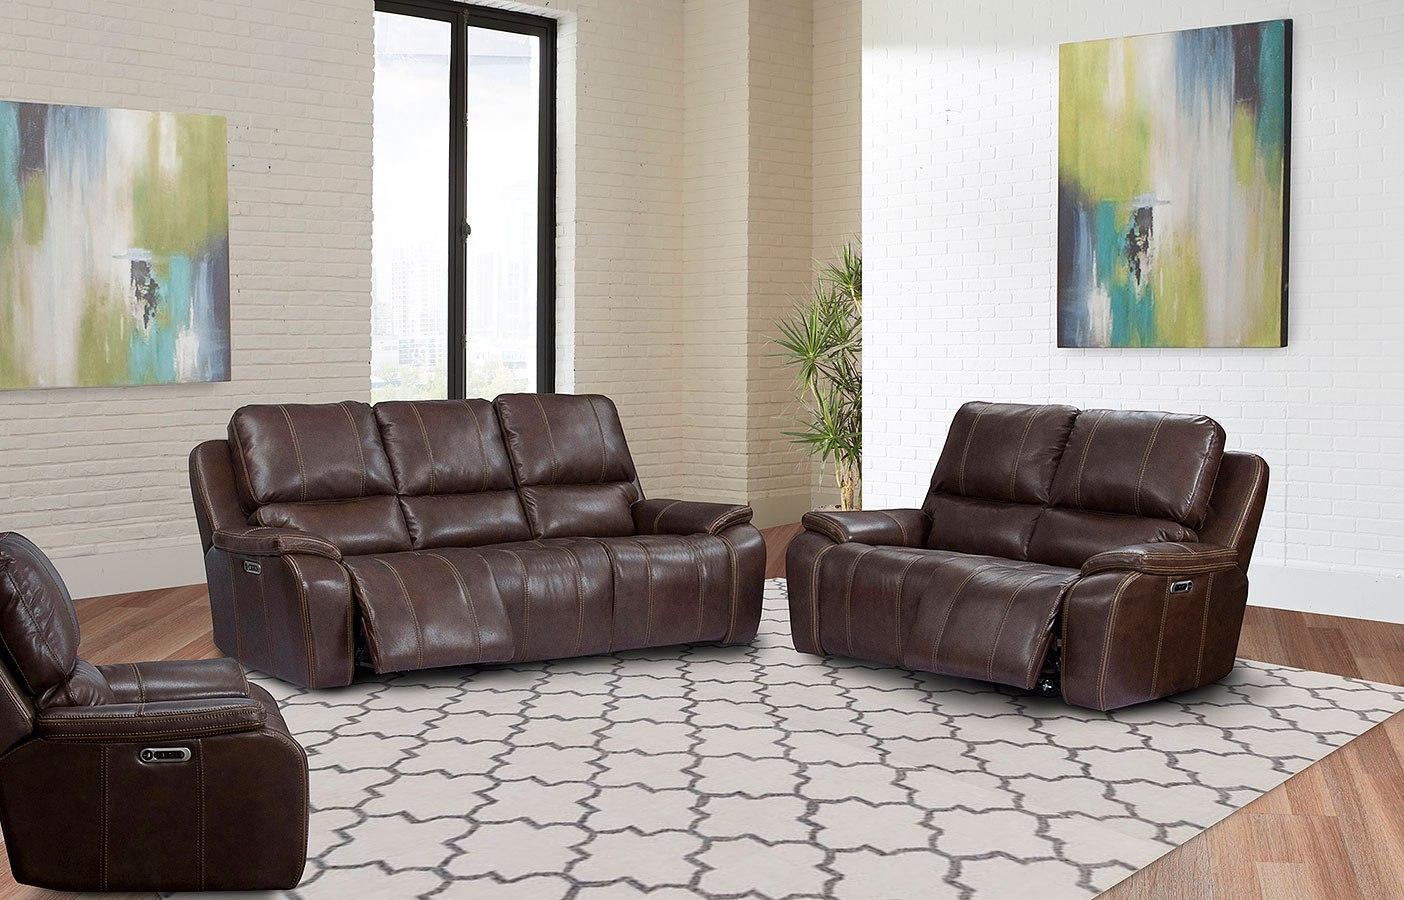 potter power reclining living room set w power headrests. Black Bedroom Furniture Sets. Home Design Ideas